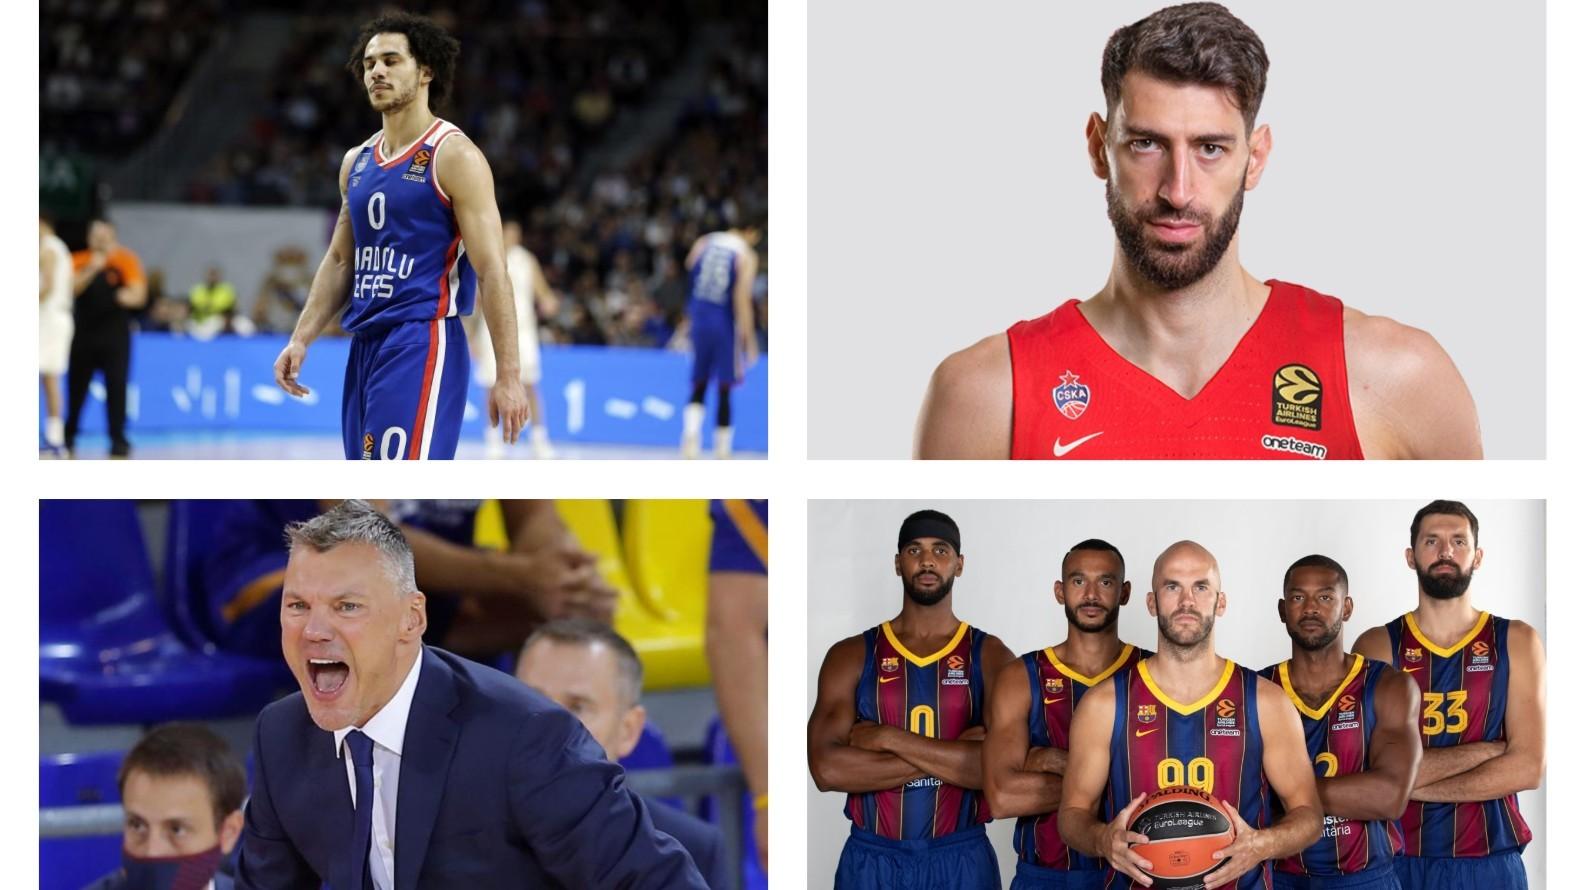 La encuesta entre capitanes de la Euroliga encumbra al Barça, el CSKA y Larkin